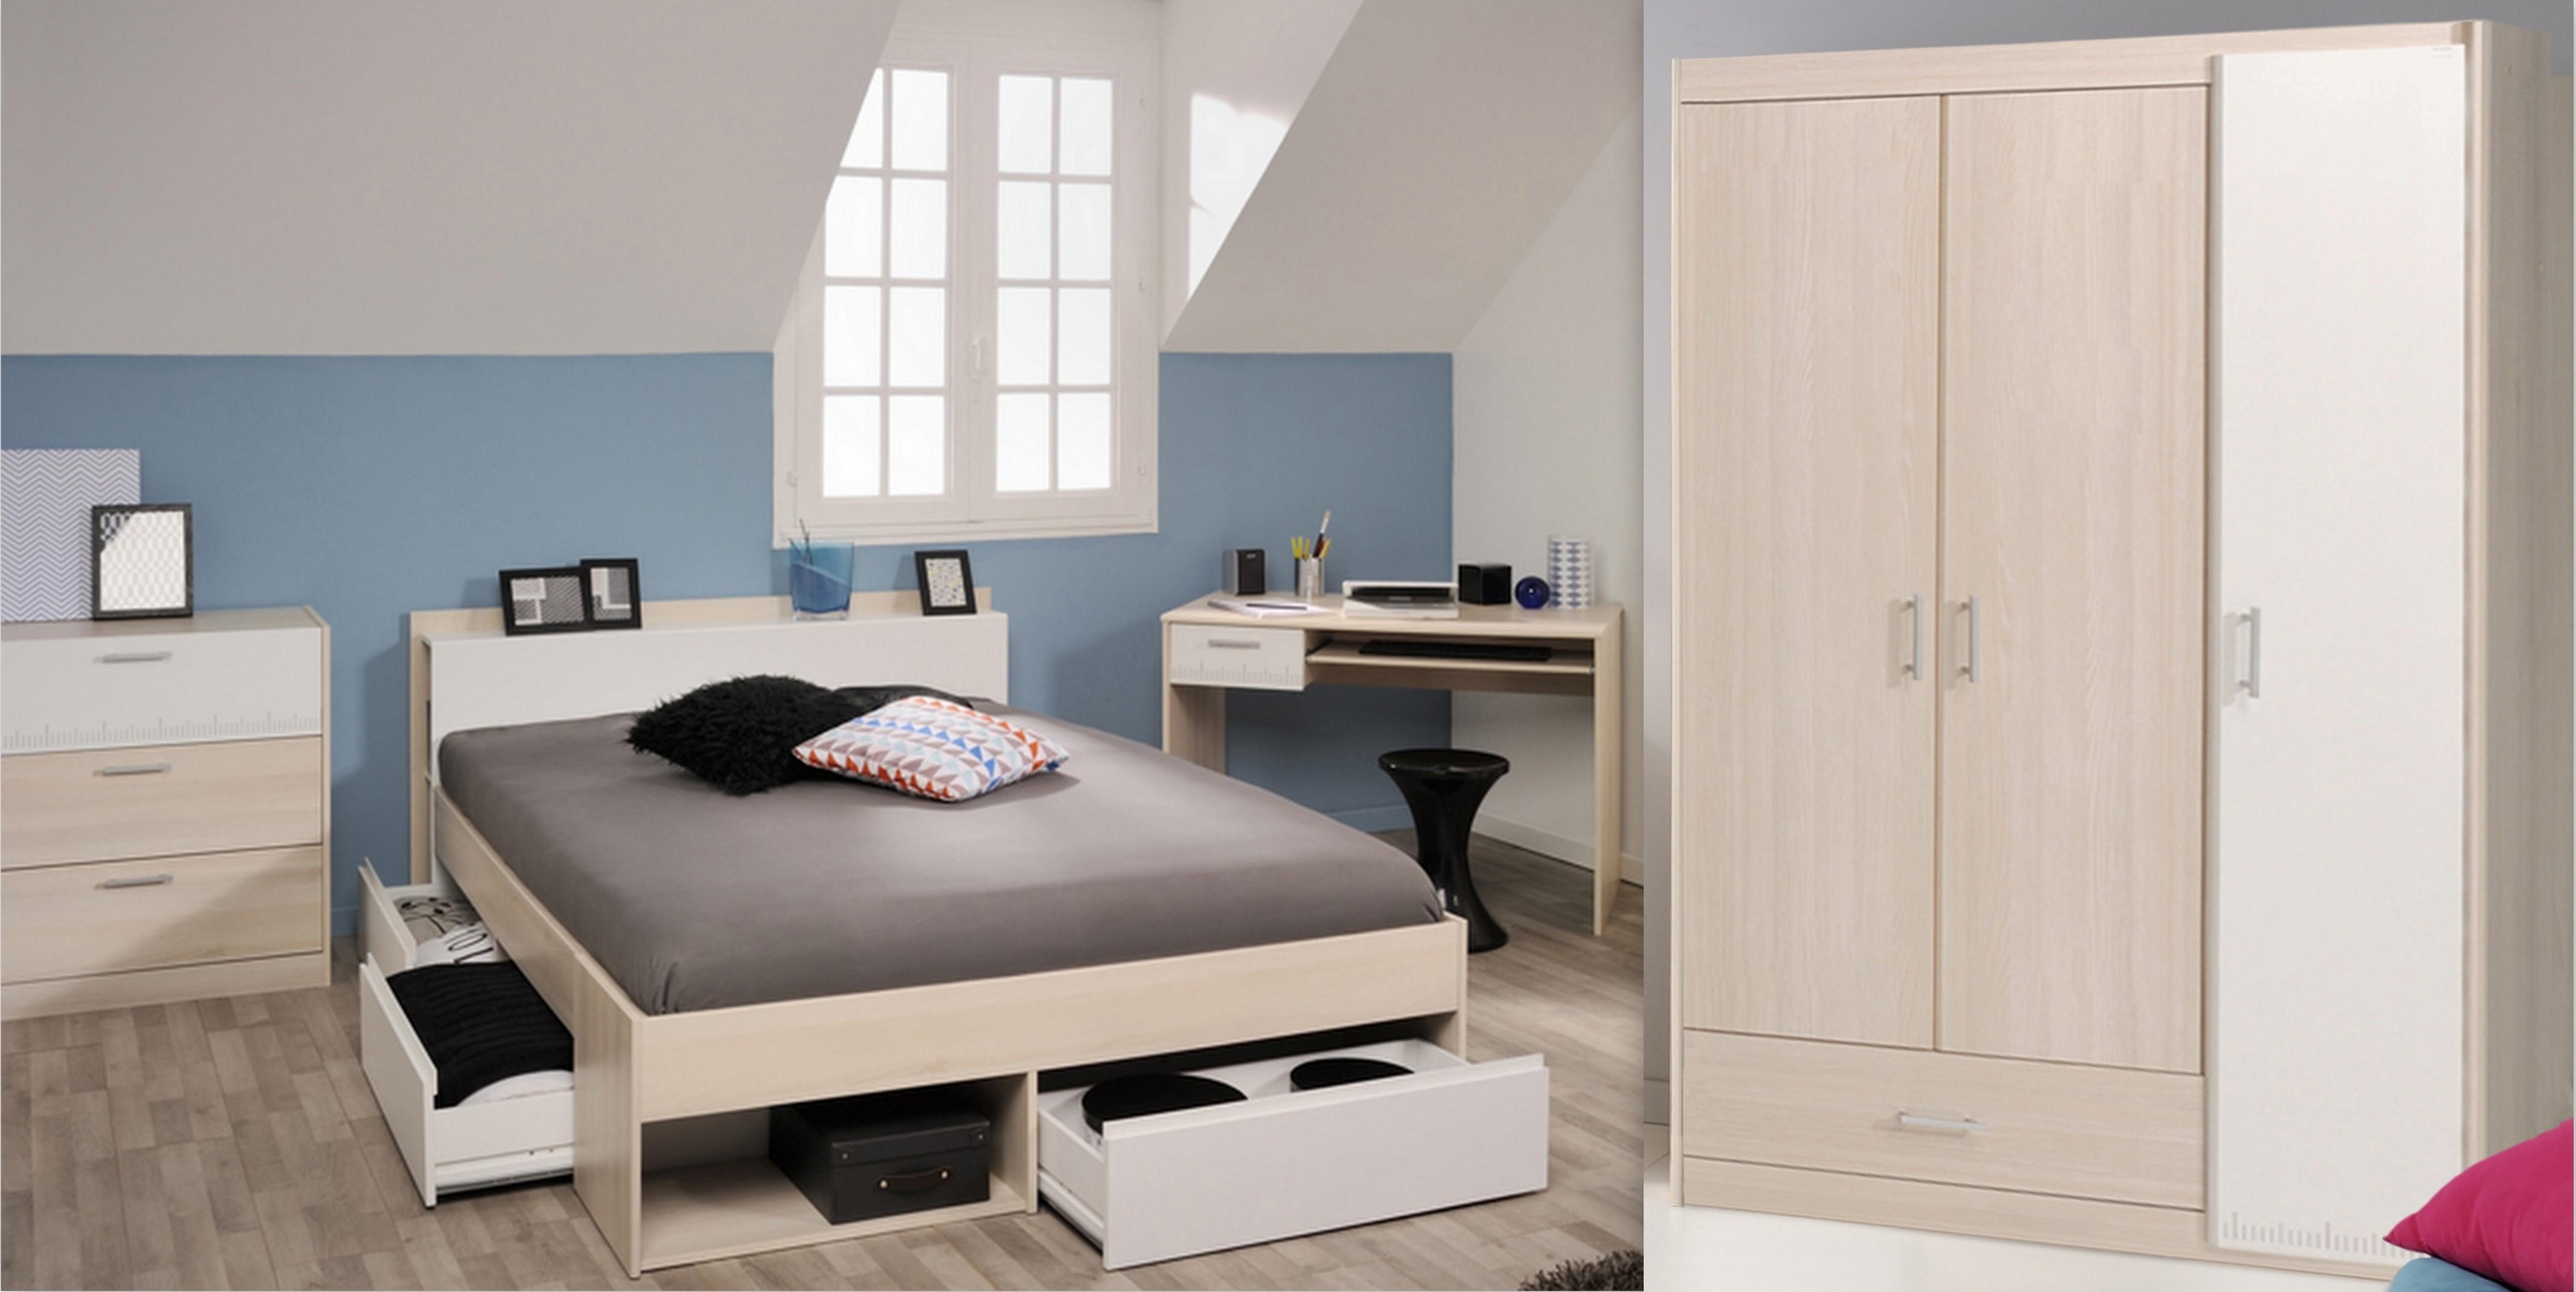 Etagenbett Set : Relita einzel etagenbett set tlg schlafwelt